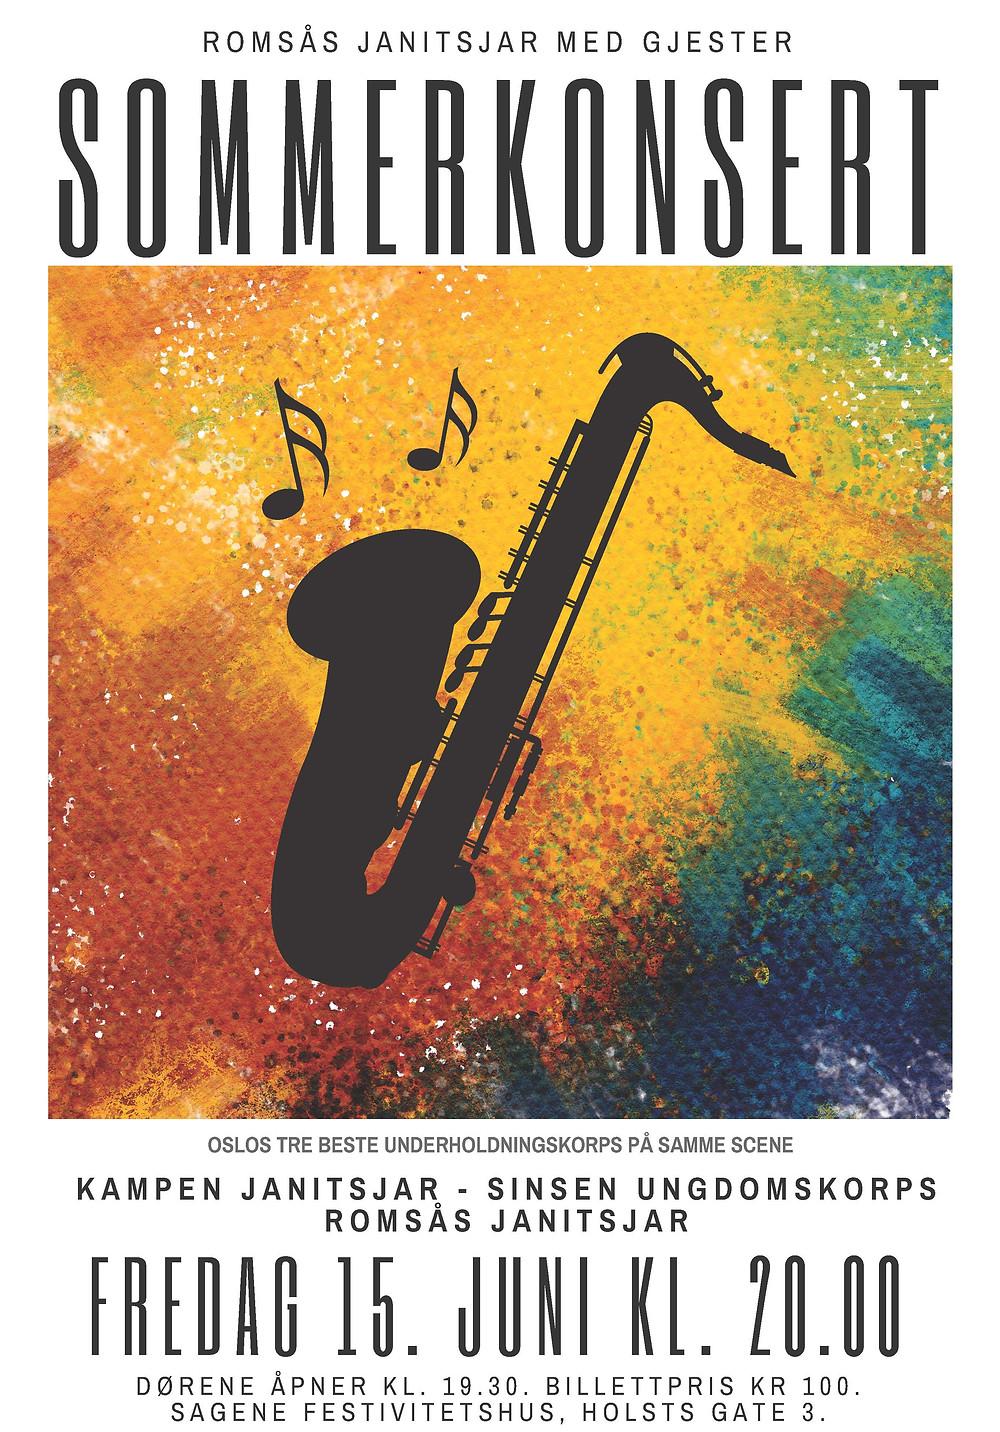 Sommerkonsert, Romsås Janitsjar, Kampen Janitsjar, Sinsen Ungdomskorps, Tarjei Grimsby